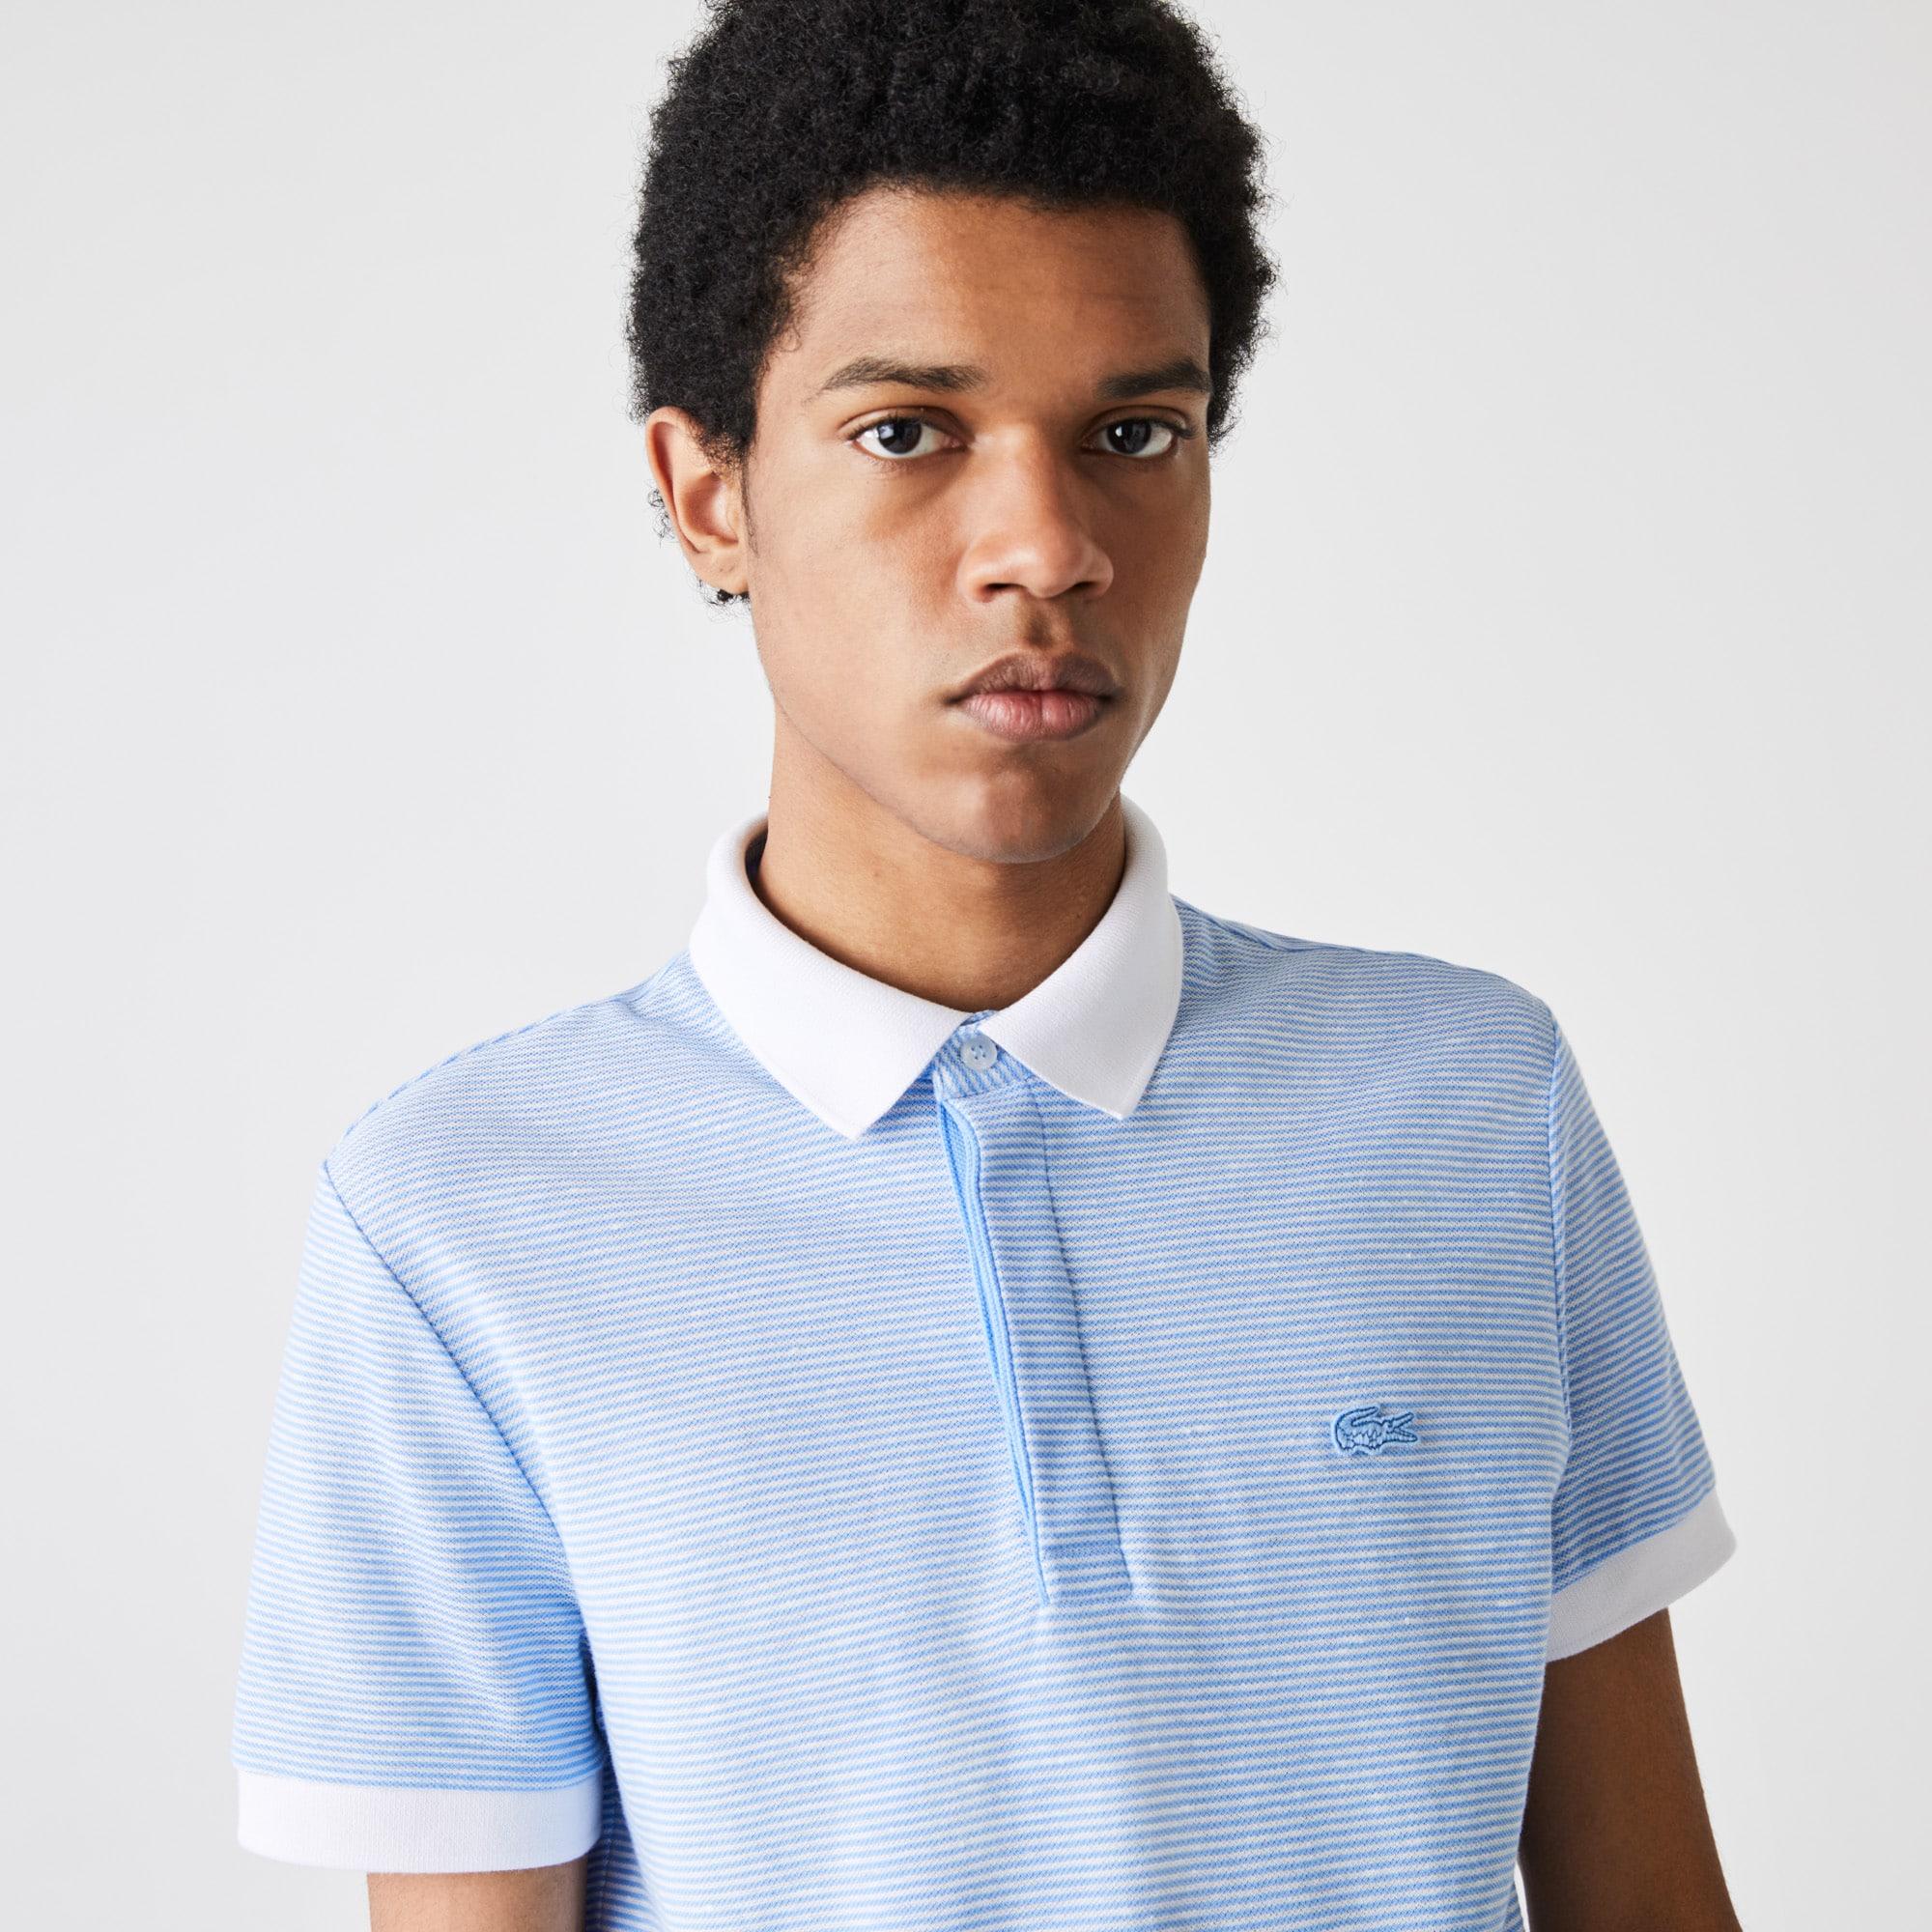 Men's Lacoste Regular Fit Striped Cotton and Linen Pique Polo Shirt